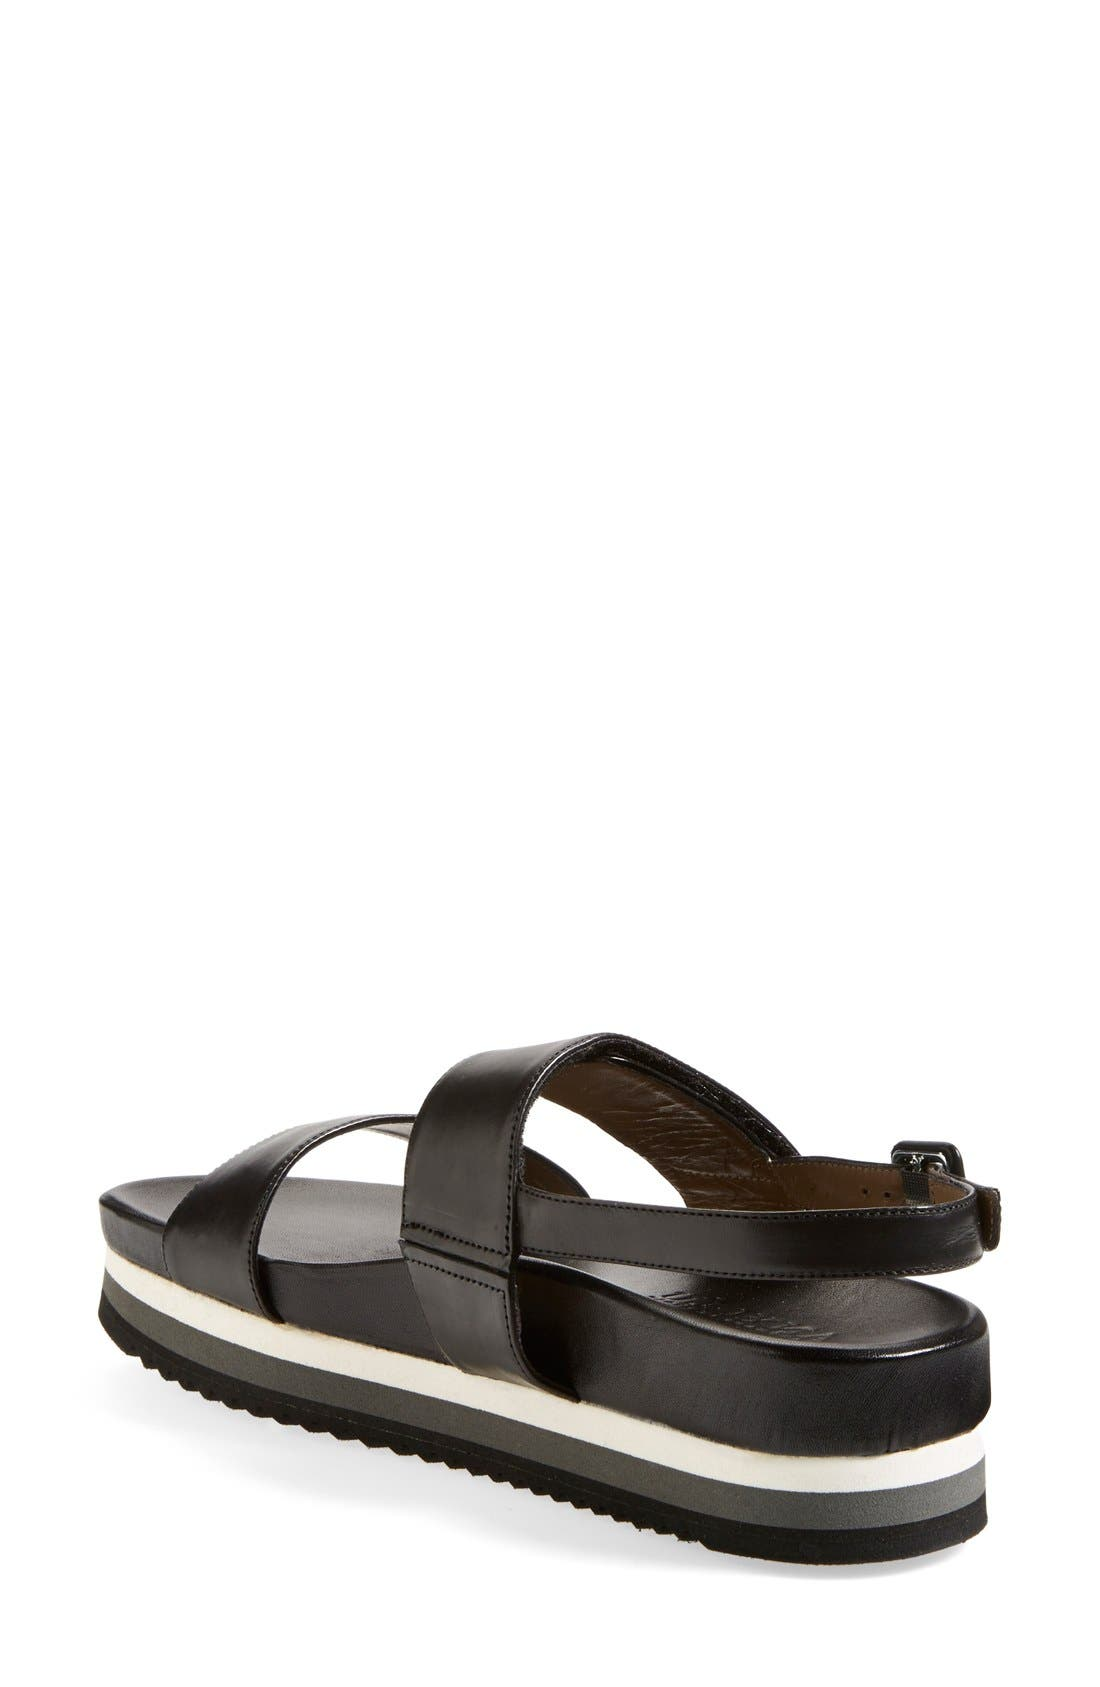 Alternate Image 4  - Anyi Lu 'Viva' Leather Platform Sandal (Women)